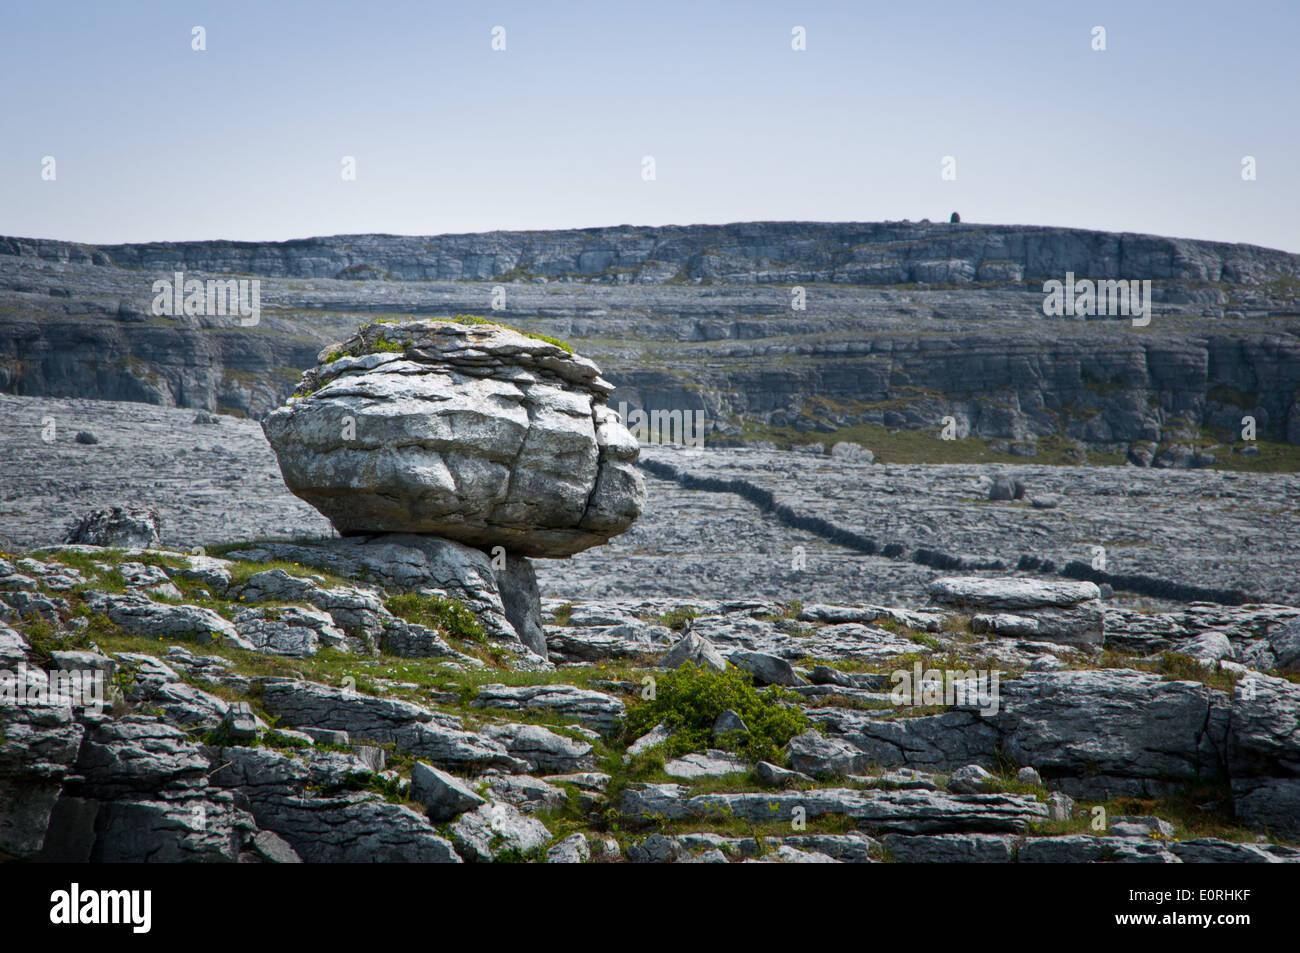 Rock Formations in Burren Region of County Clare, Ireland - Stock Image